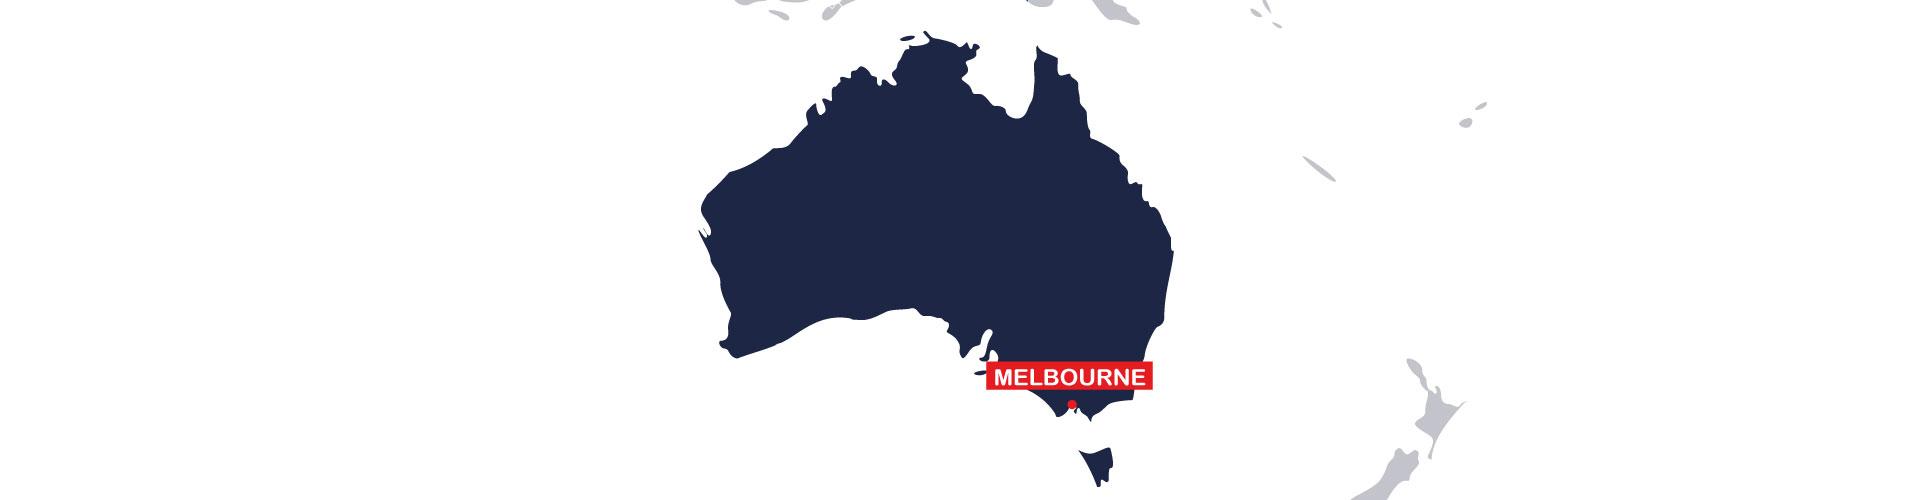 MAP AUSTRALIA EN.jpg